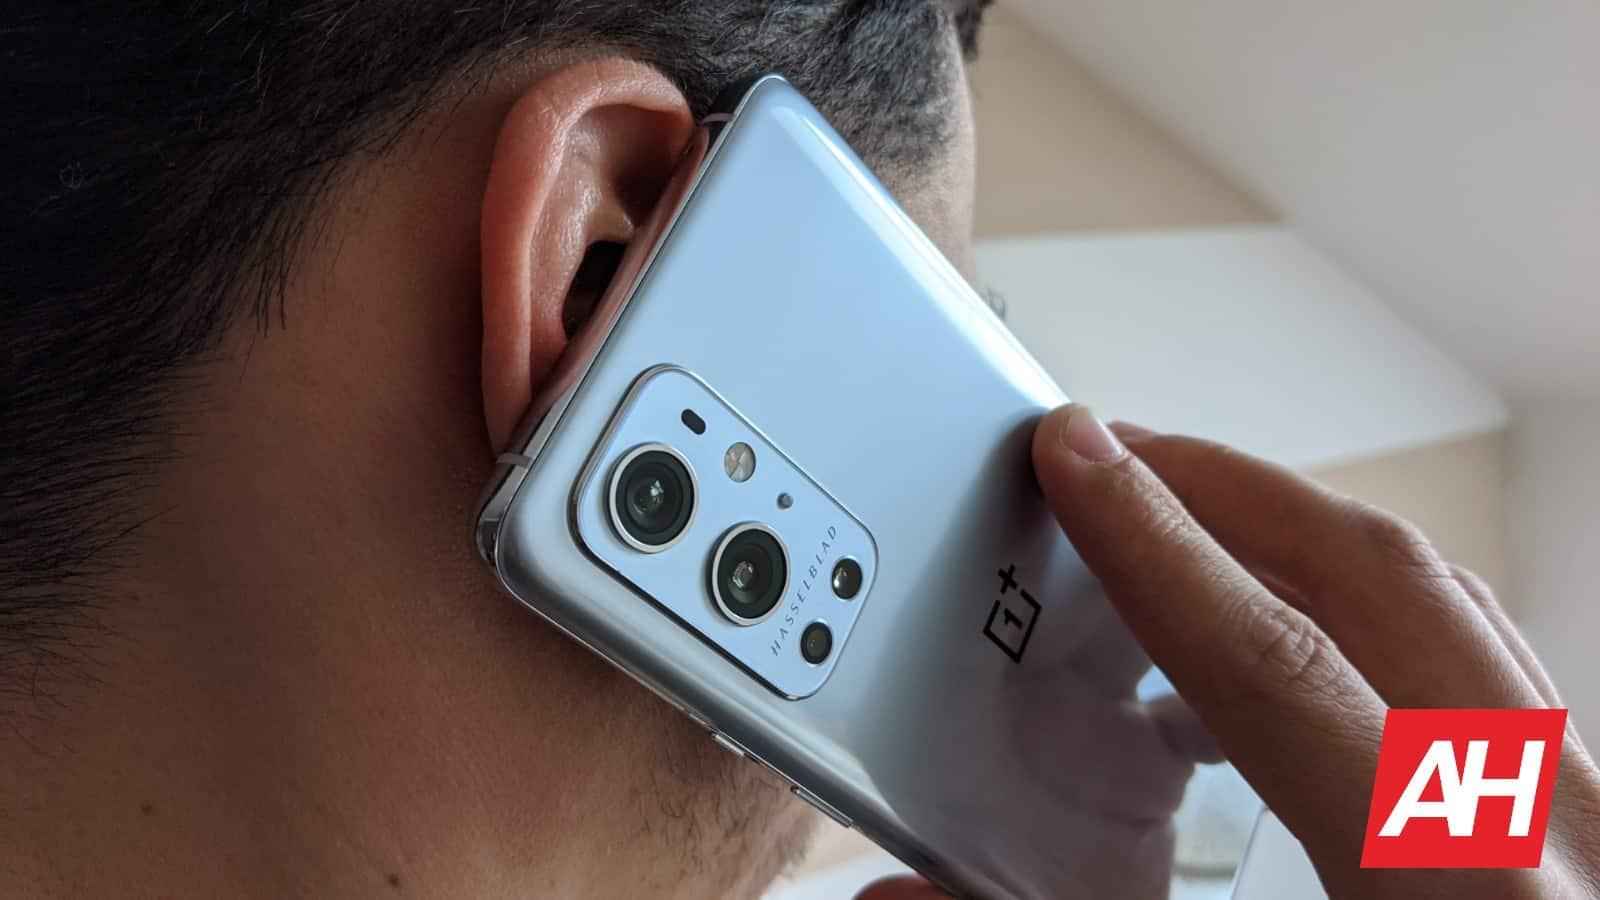 AH OnePlus 9 Pro KL image 23